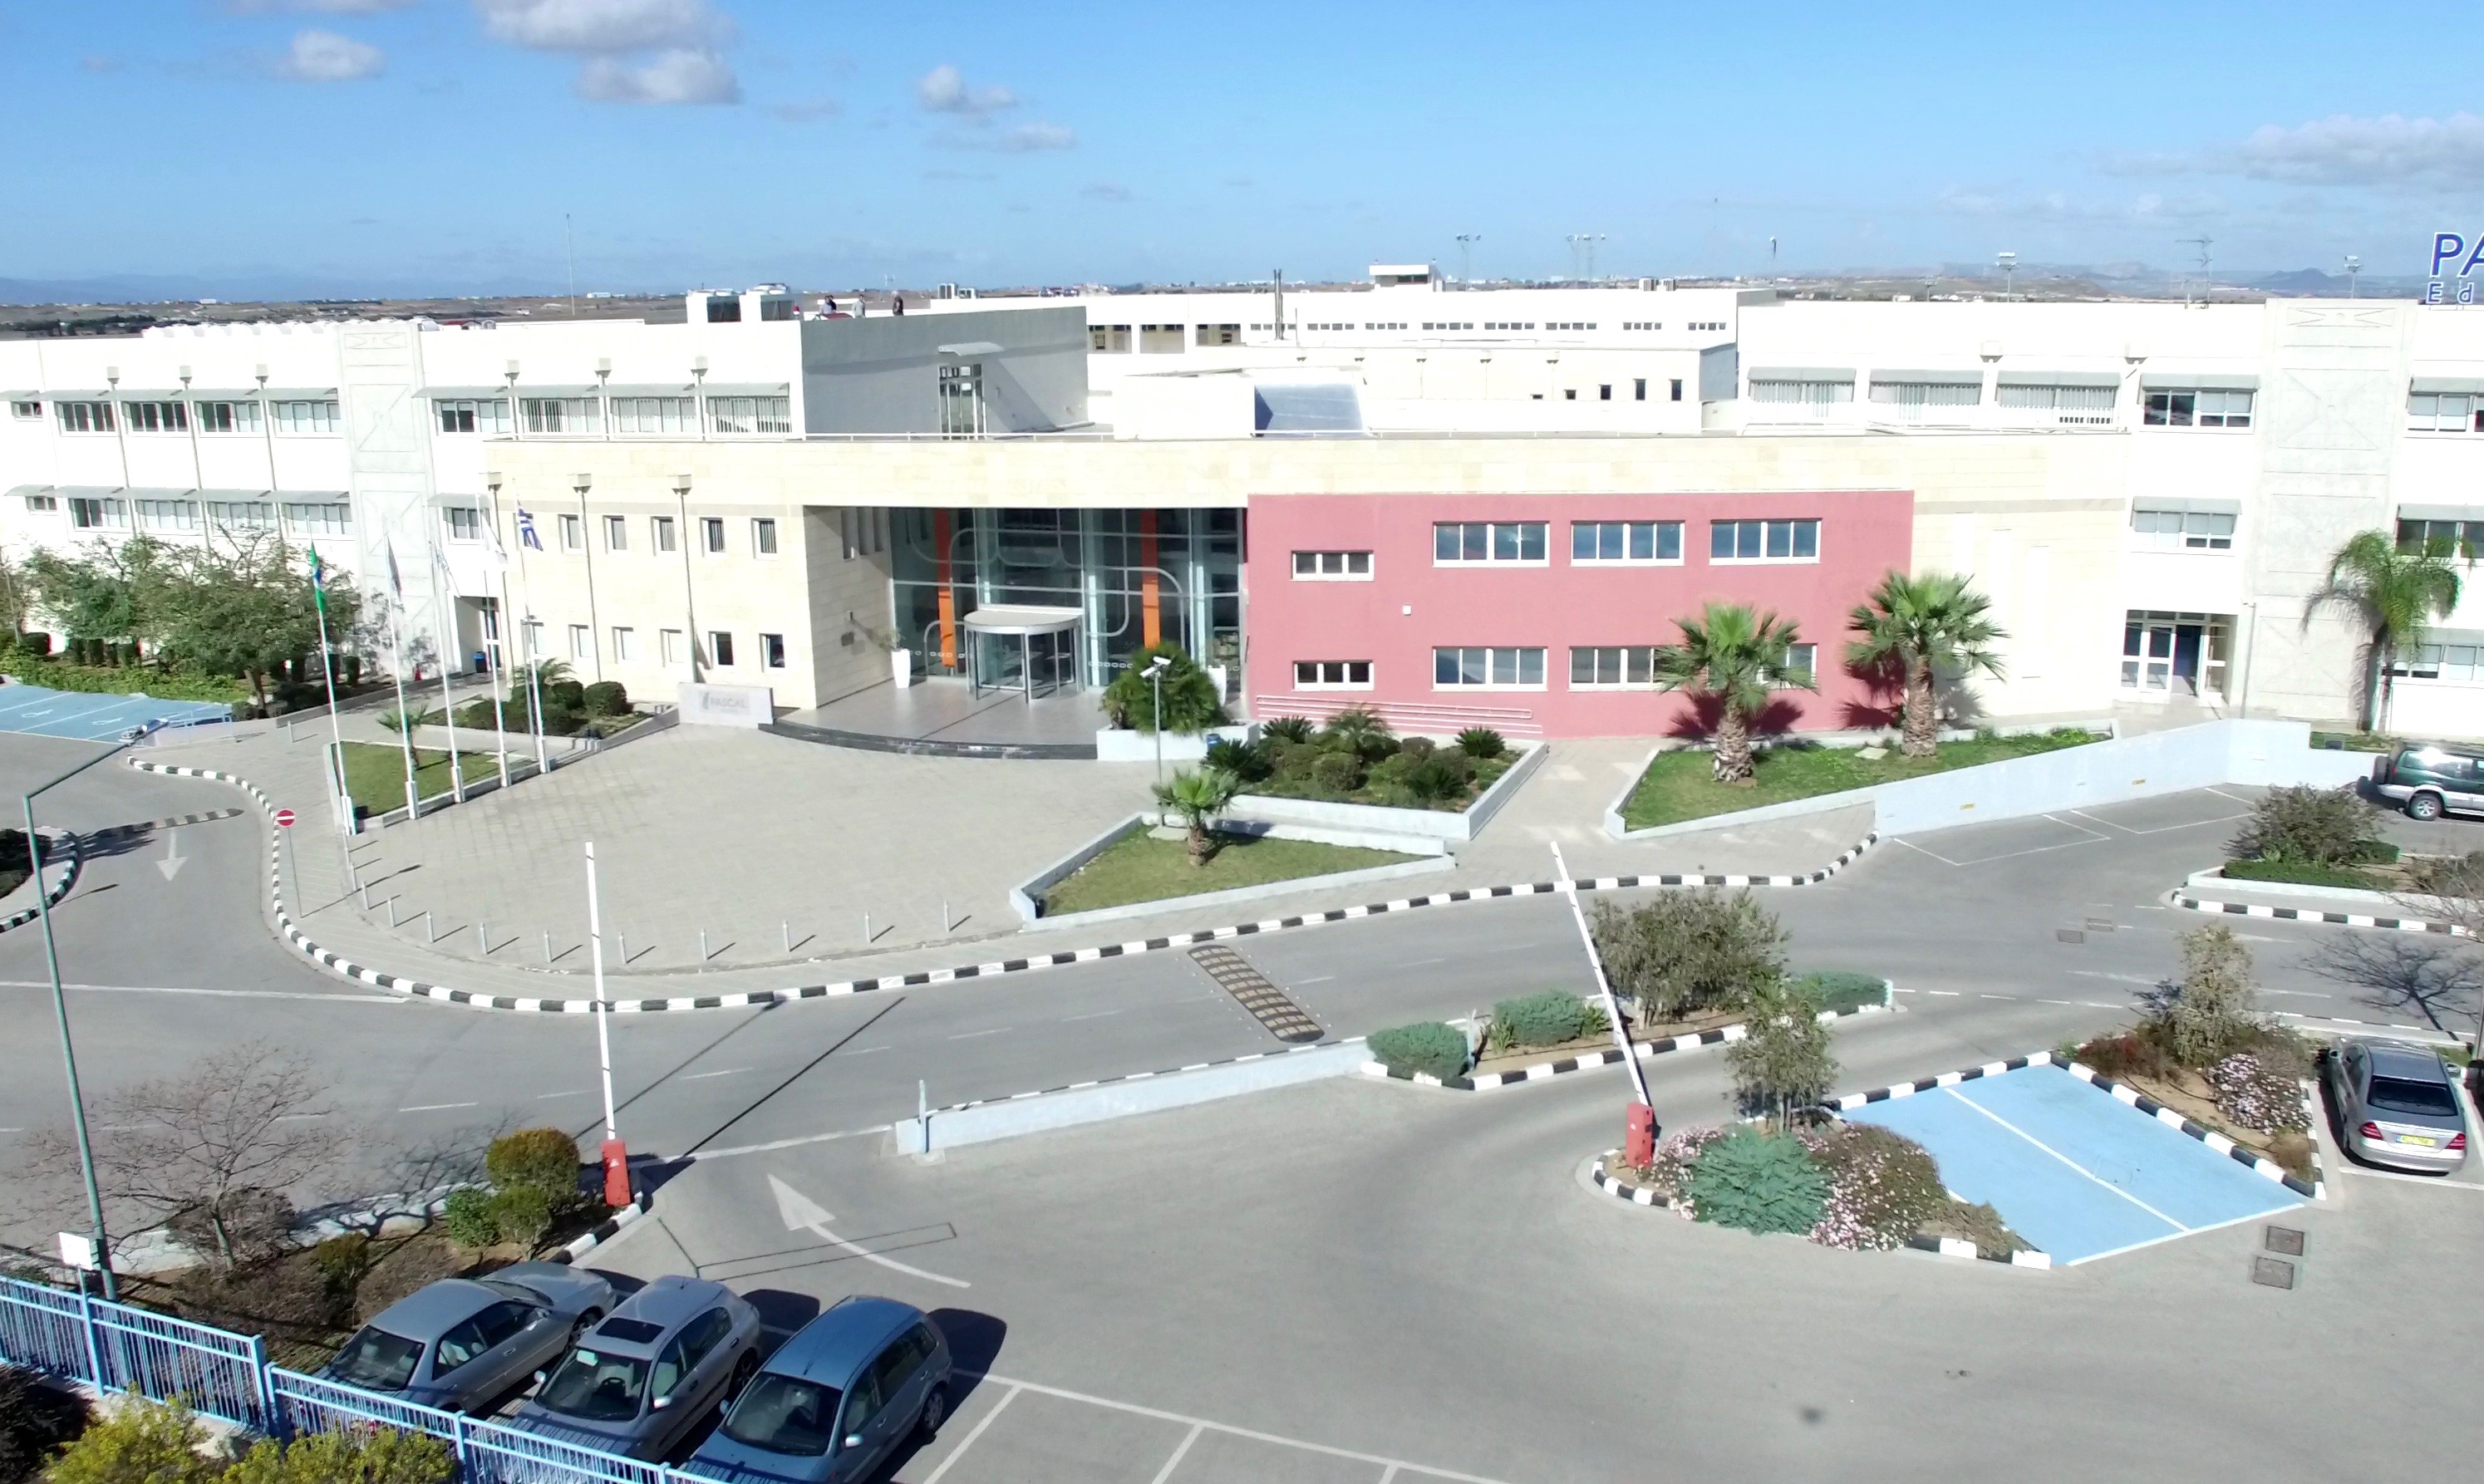 Школы на кипре отзывы аквапарк лагуна дубай отзывы